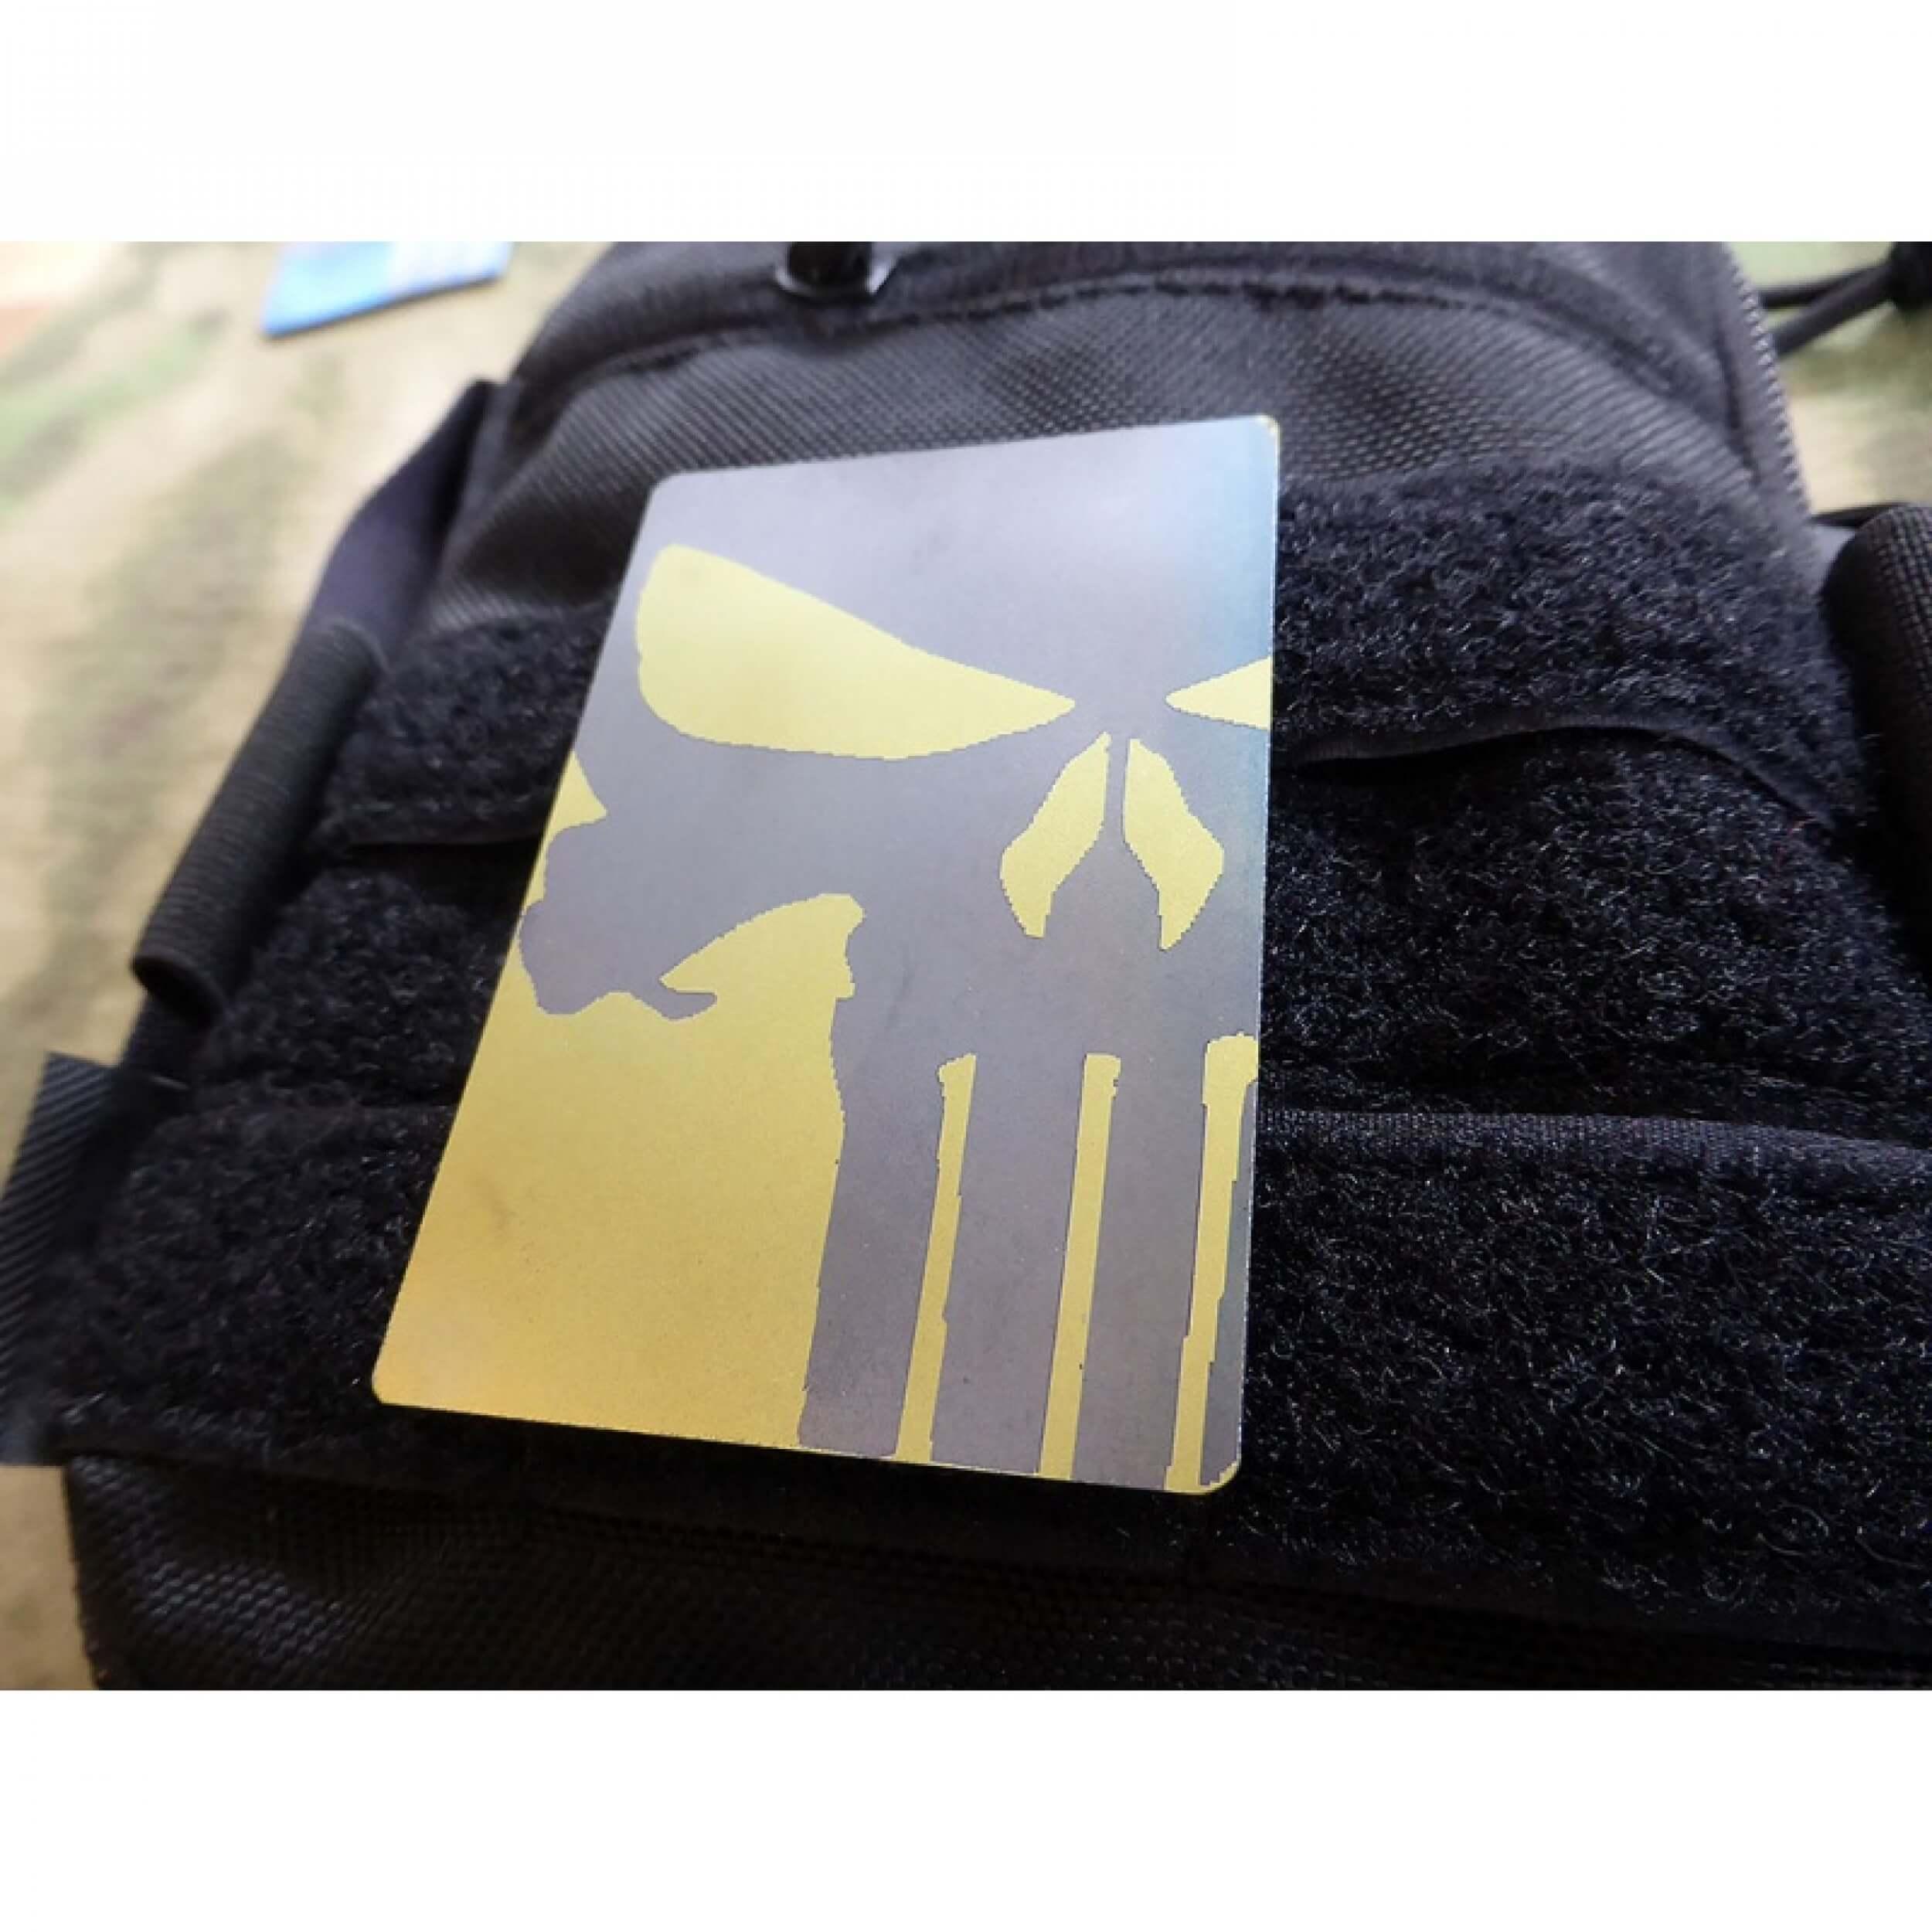 JTG Titanium Punisher Patch, gold